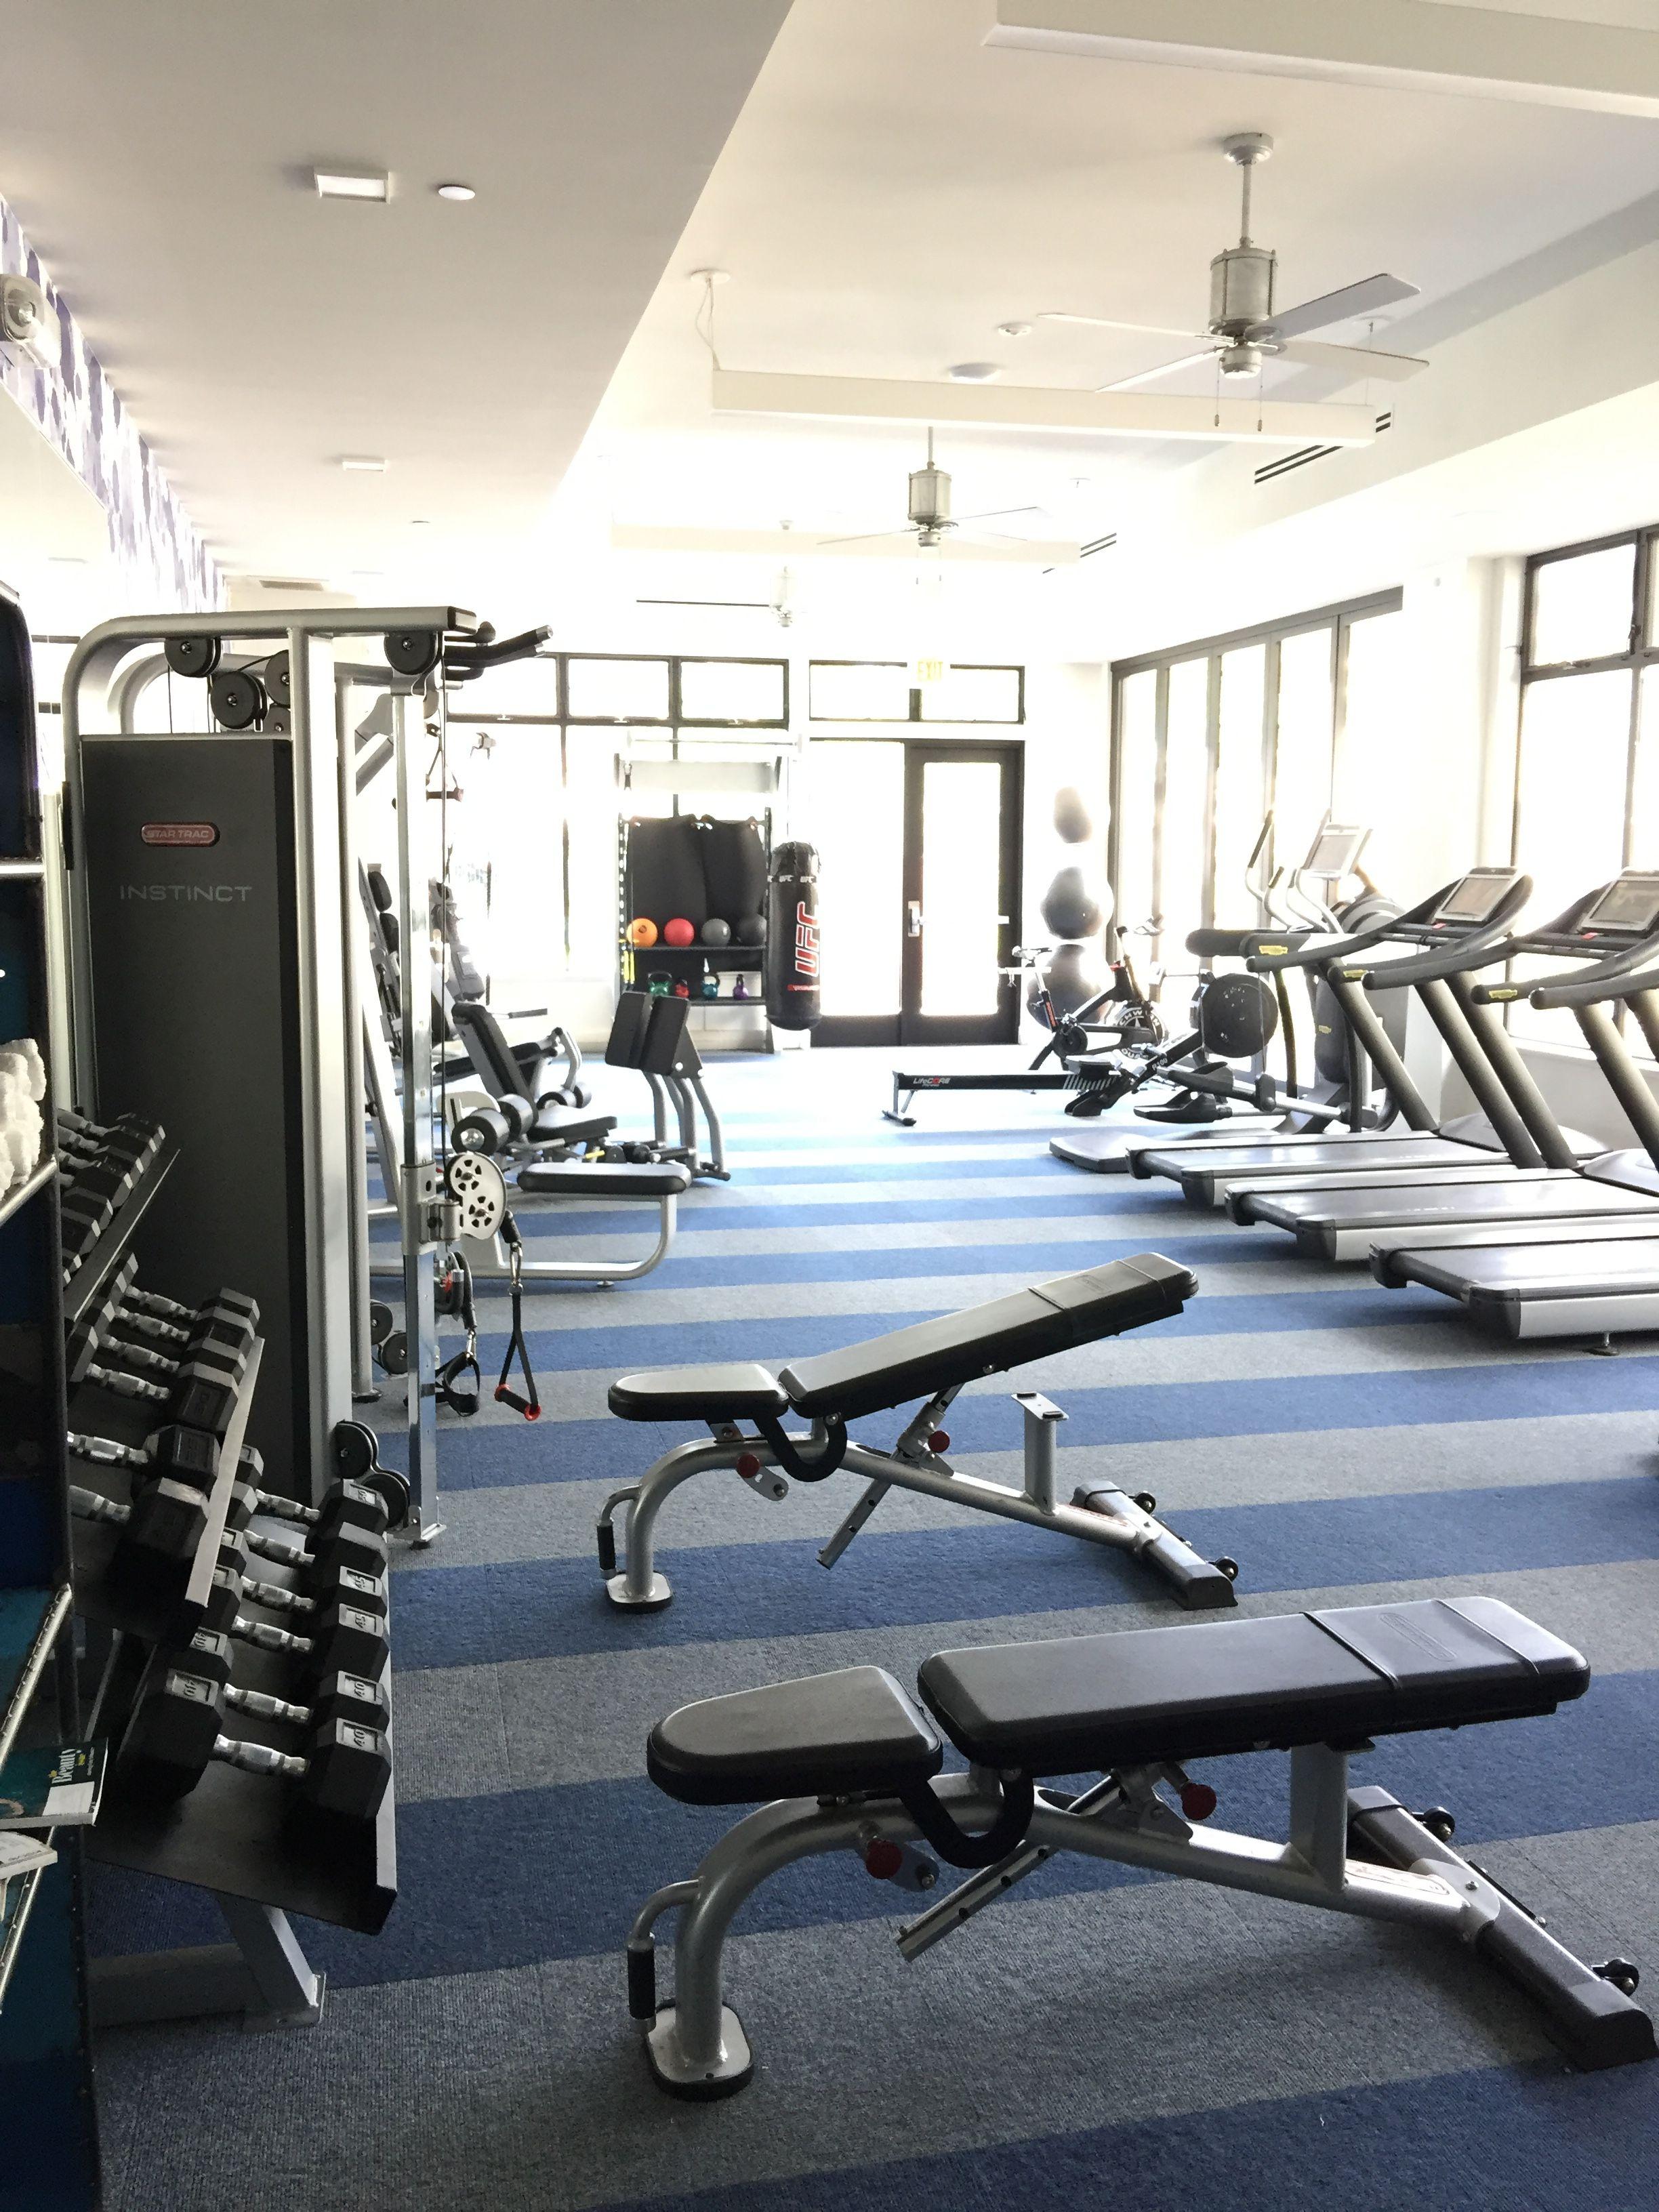 Pin by albee lee on prometheus gym equipment treadmill gym